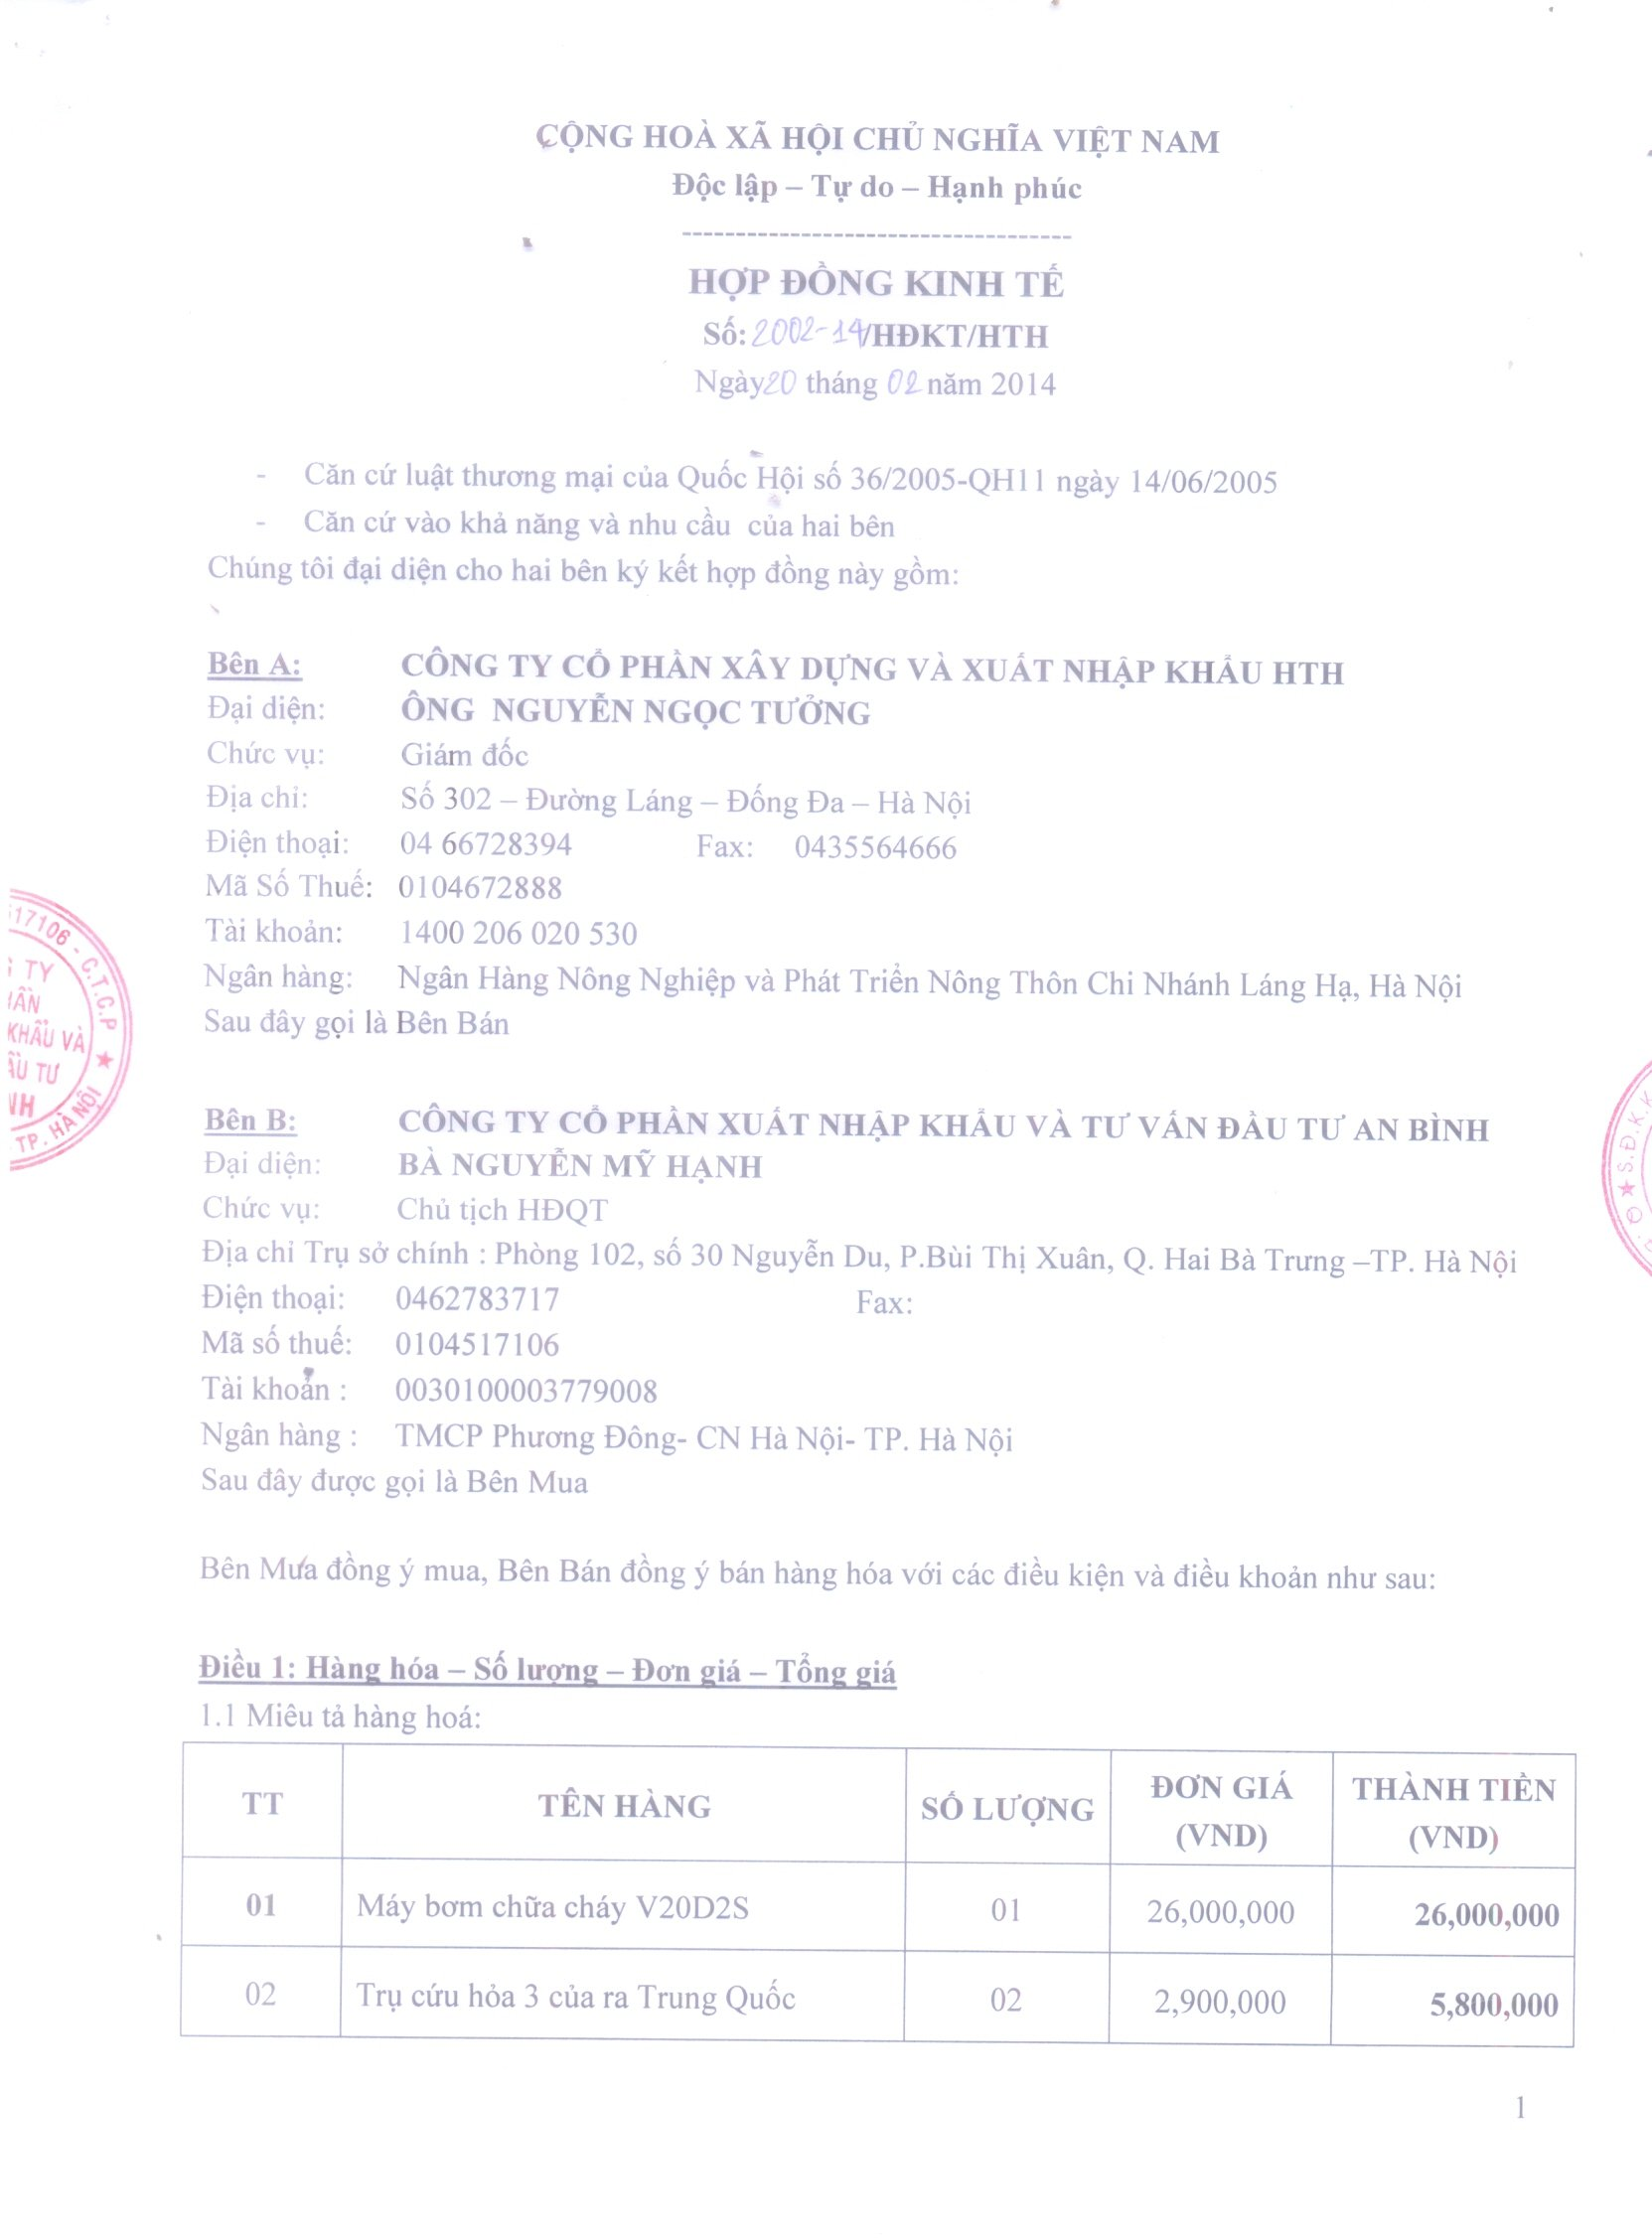 https://maybomcuuhoa.com.vn/images//2014/02/scan0002.jpg